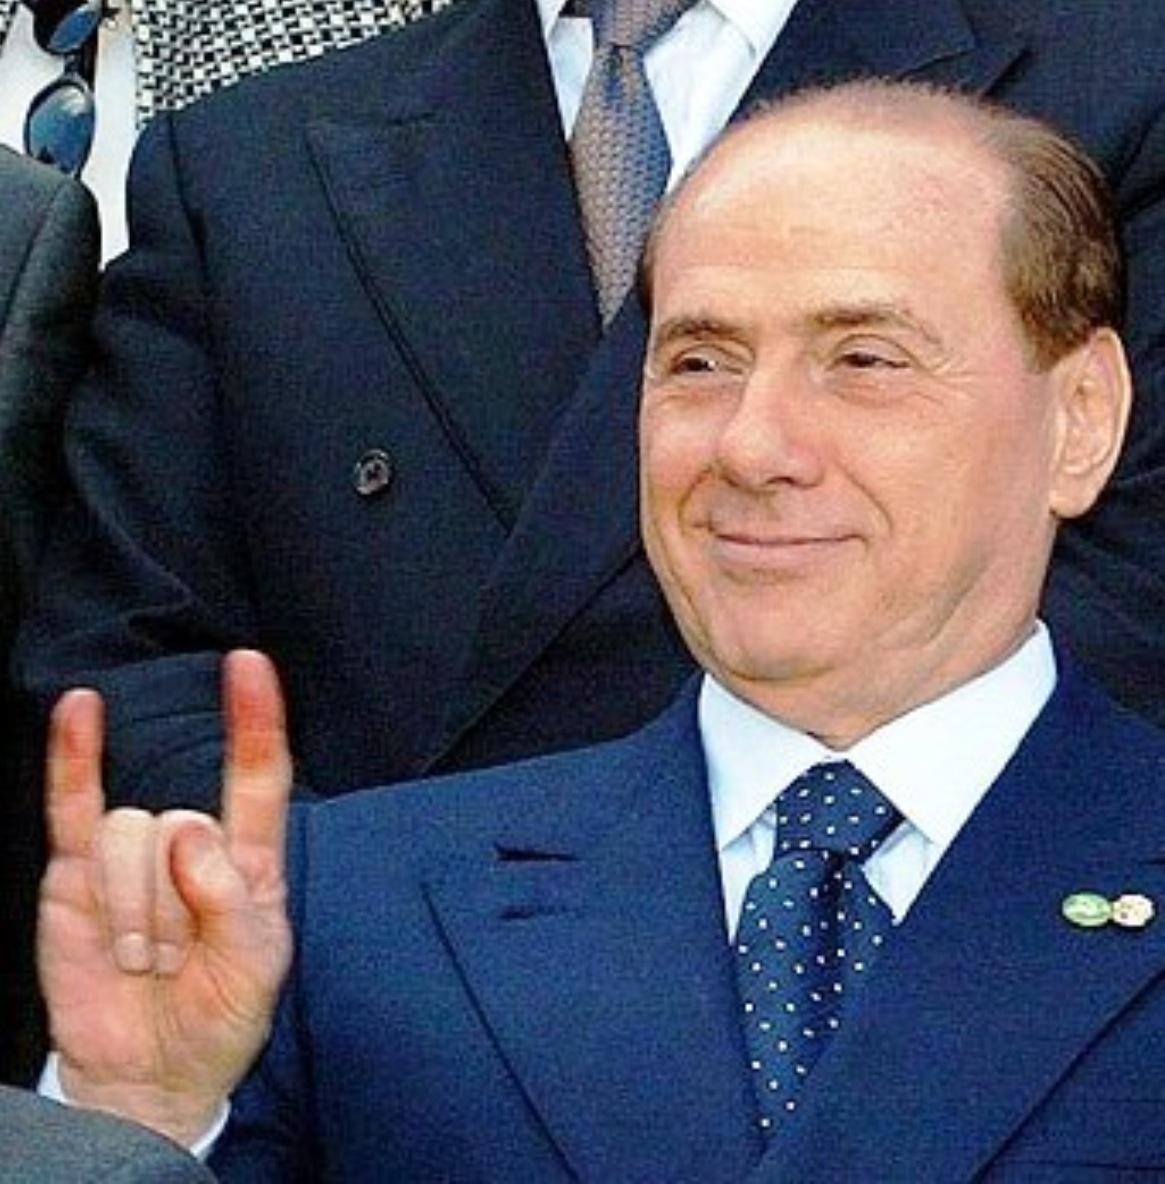 https://i0.wp.com/www.giornalettismo.com/wp-content/uploads/2012/12/scandali-di-berlusconi26.jpg